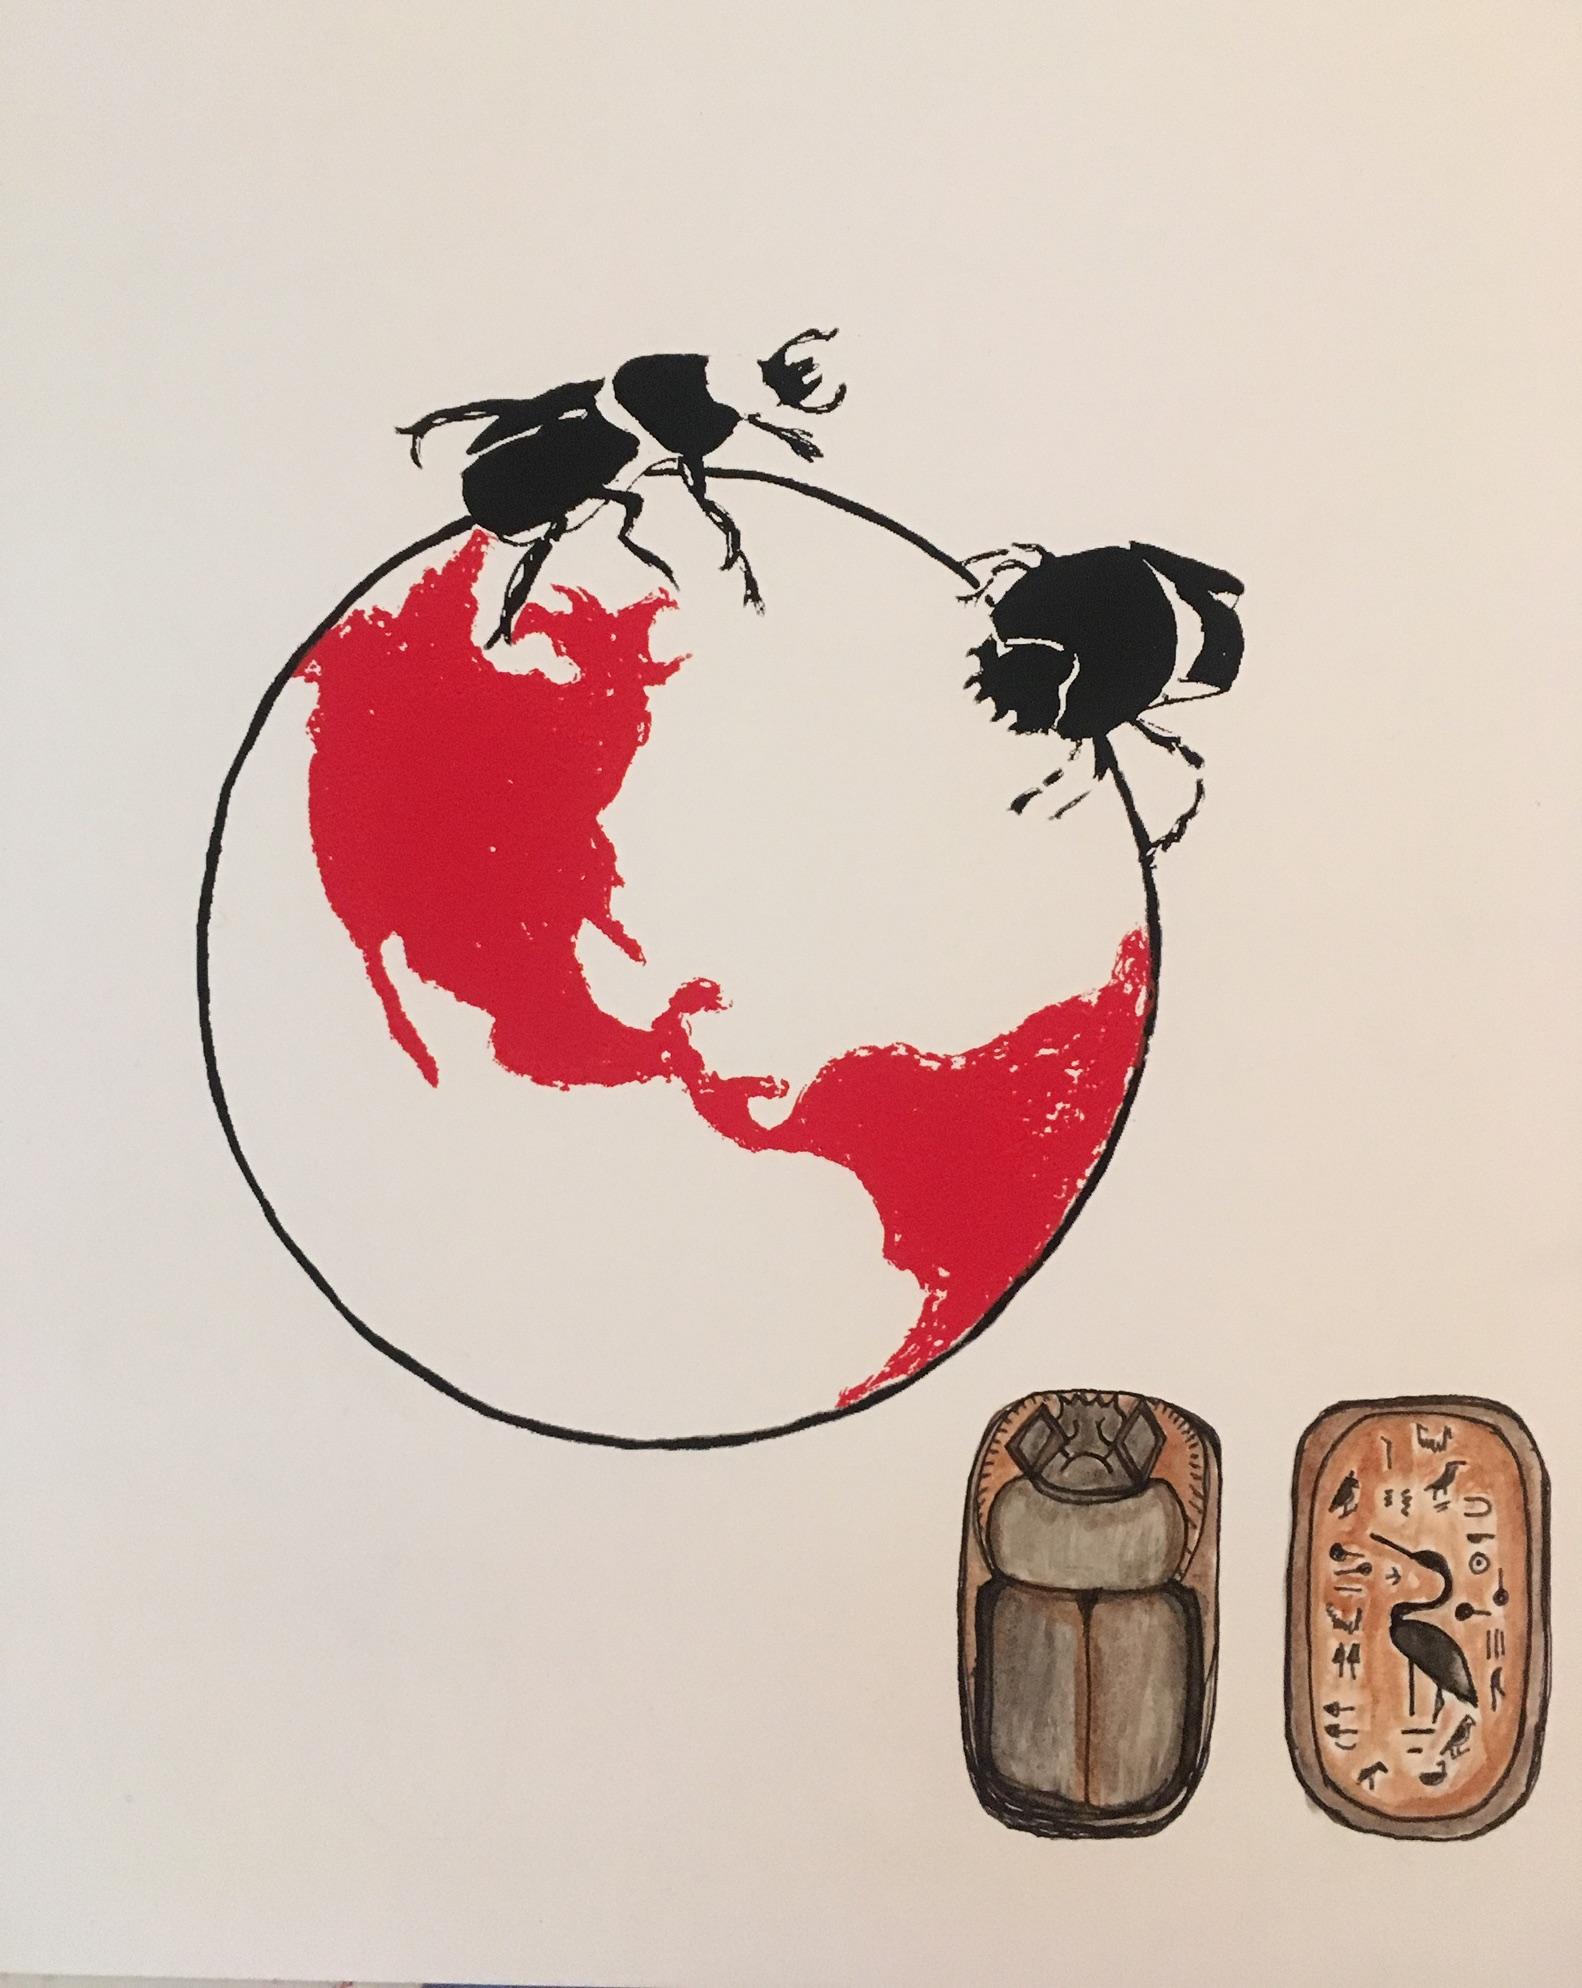 Dung beetle series/scarab